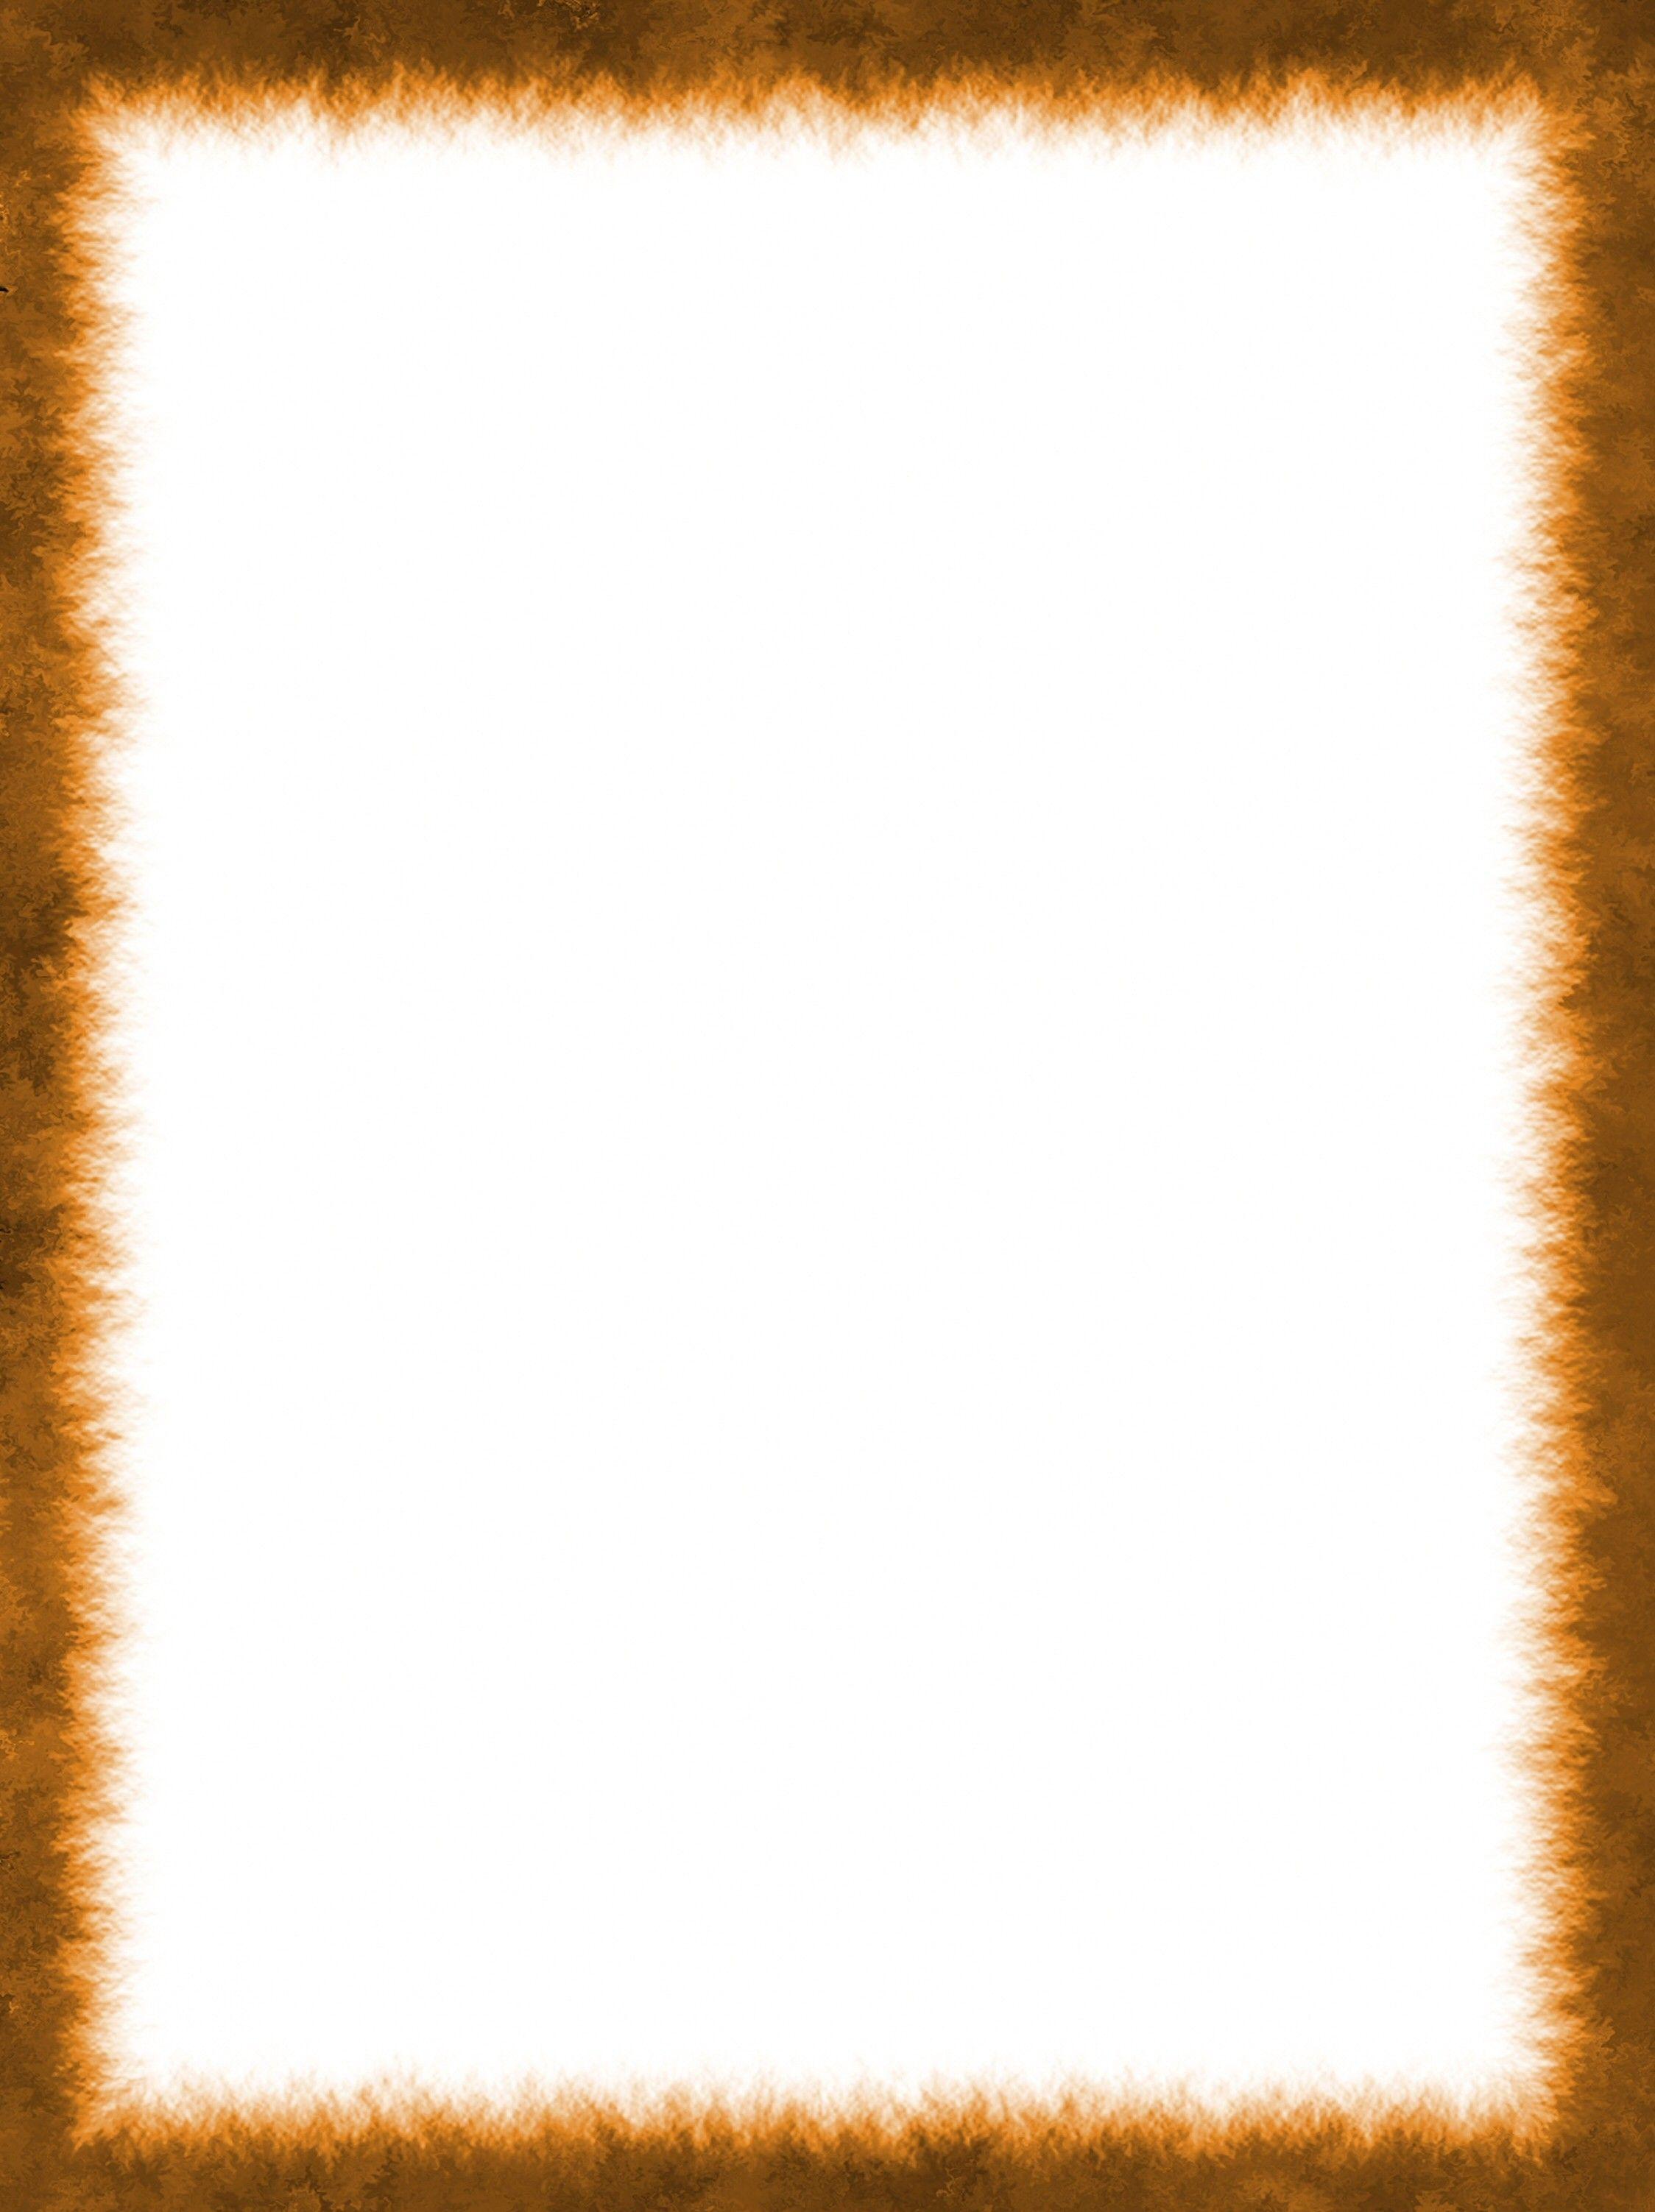 free microsoft borders and frames - wow com